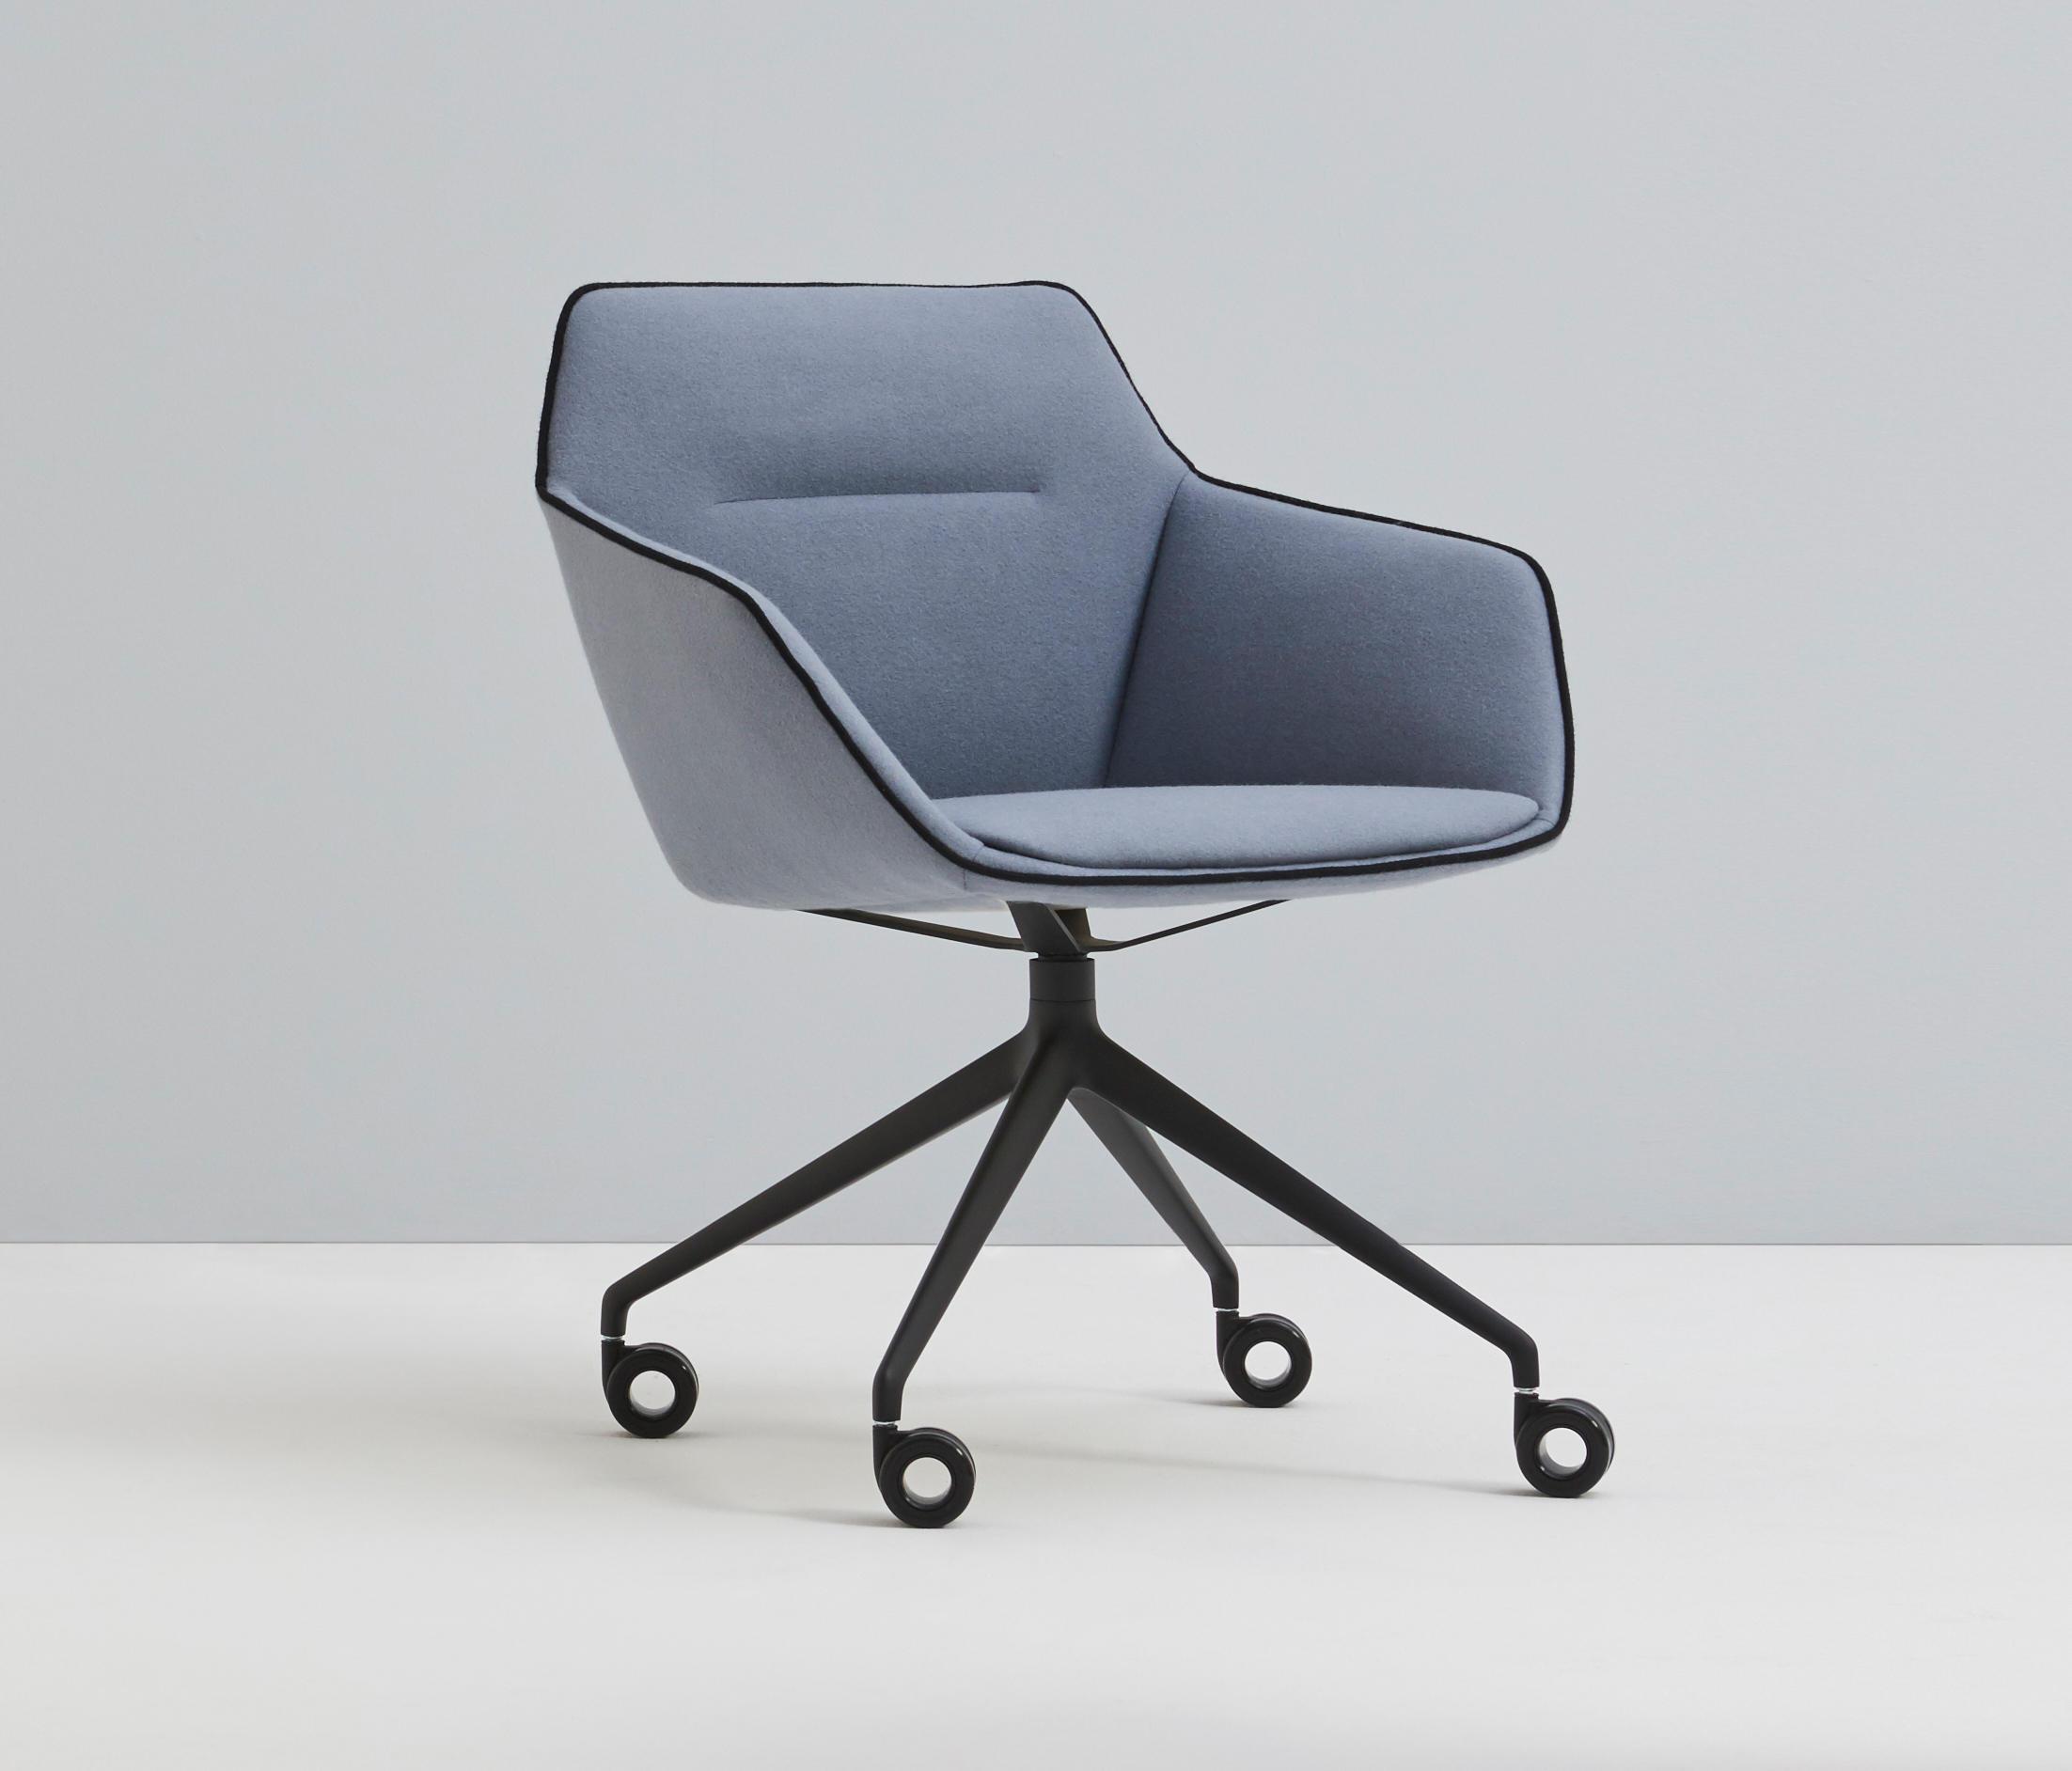 Charmant Sachet By Davis Furniture   Chairs